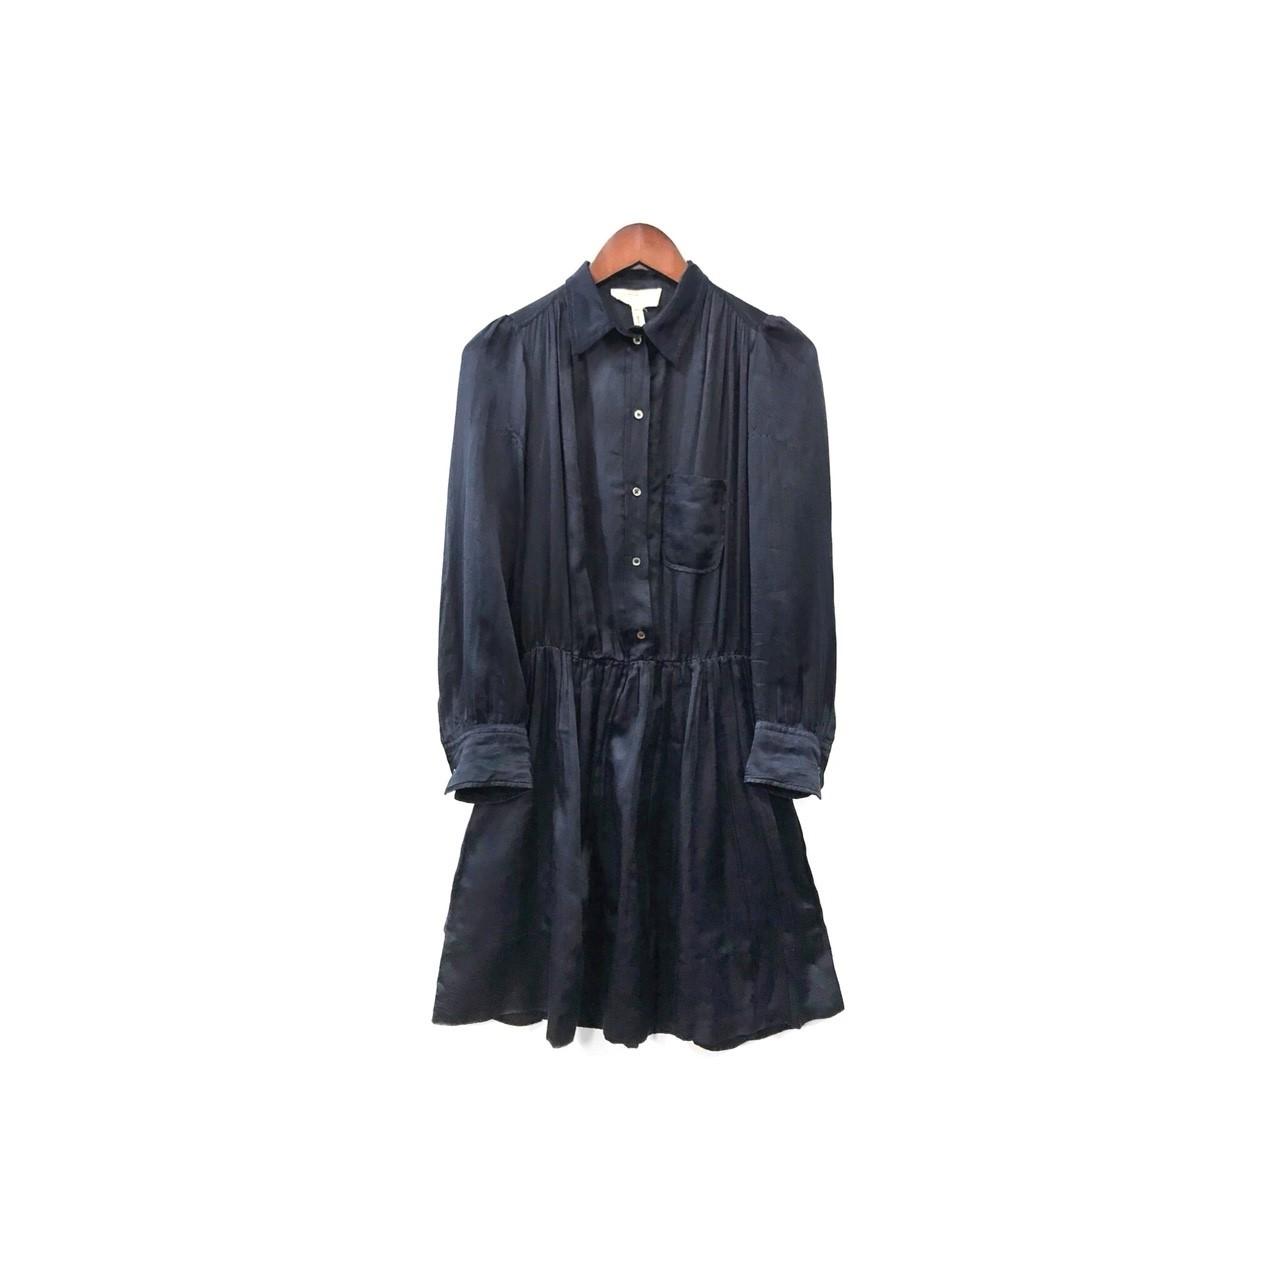 ISABEL MARANT - Silk & Cotton Shirt One-piece (size - 0) ¥9500+tax→¥5700+tax